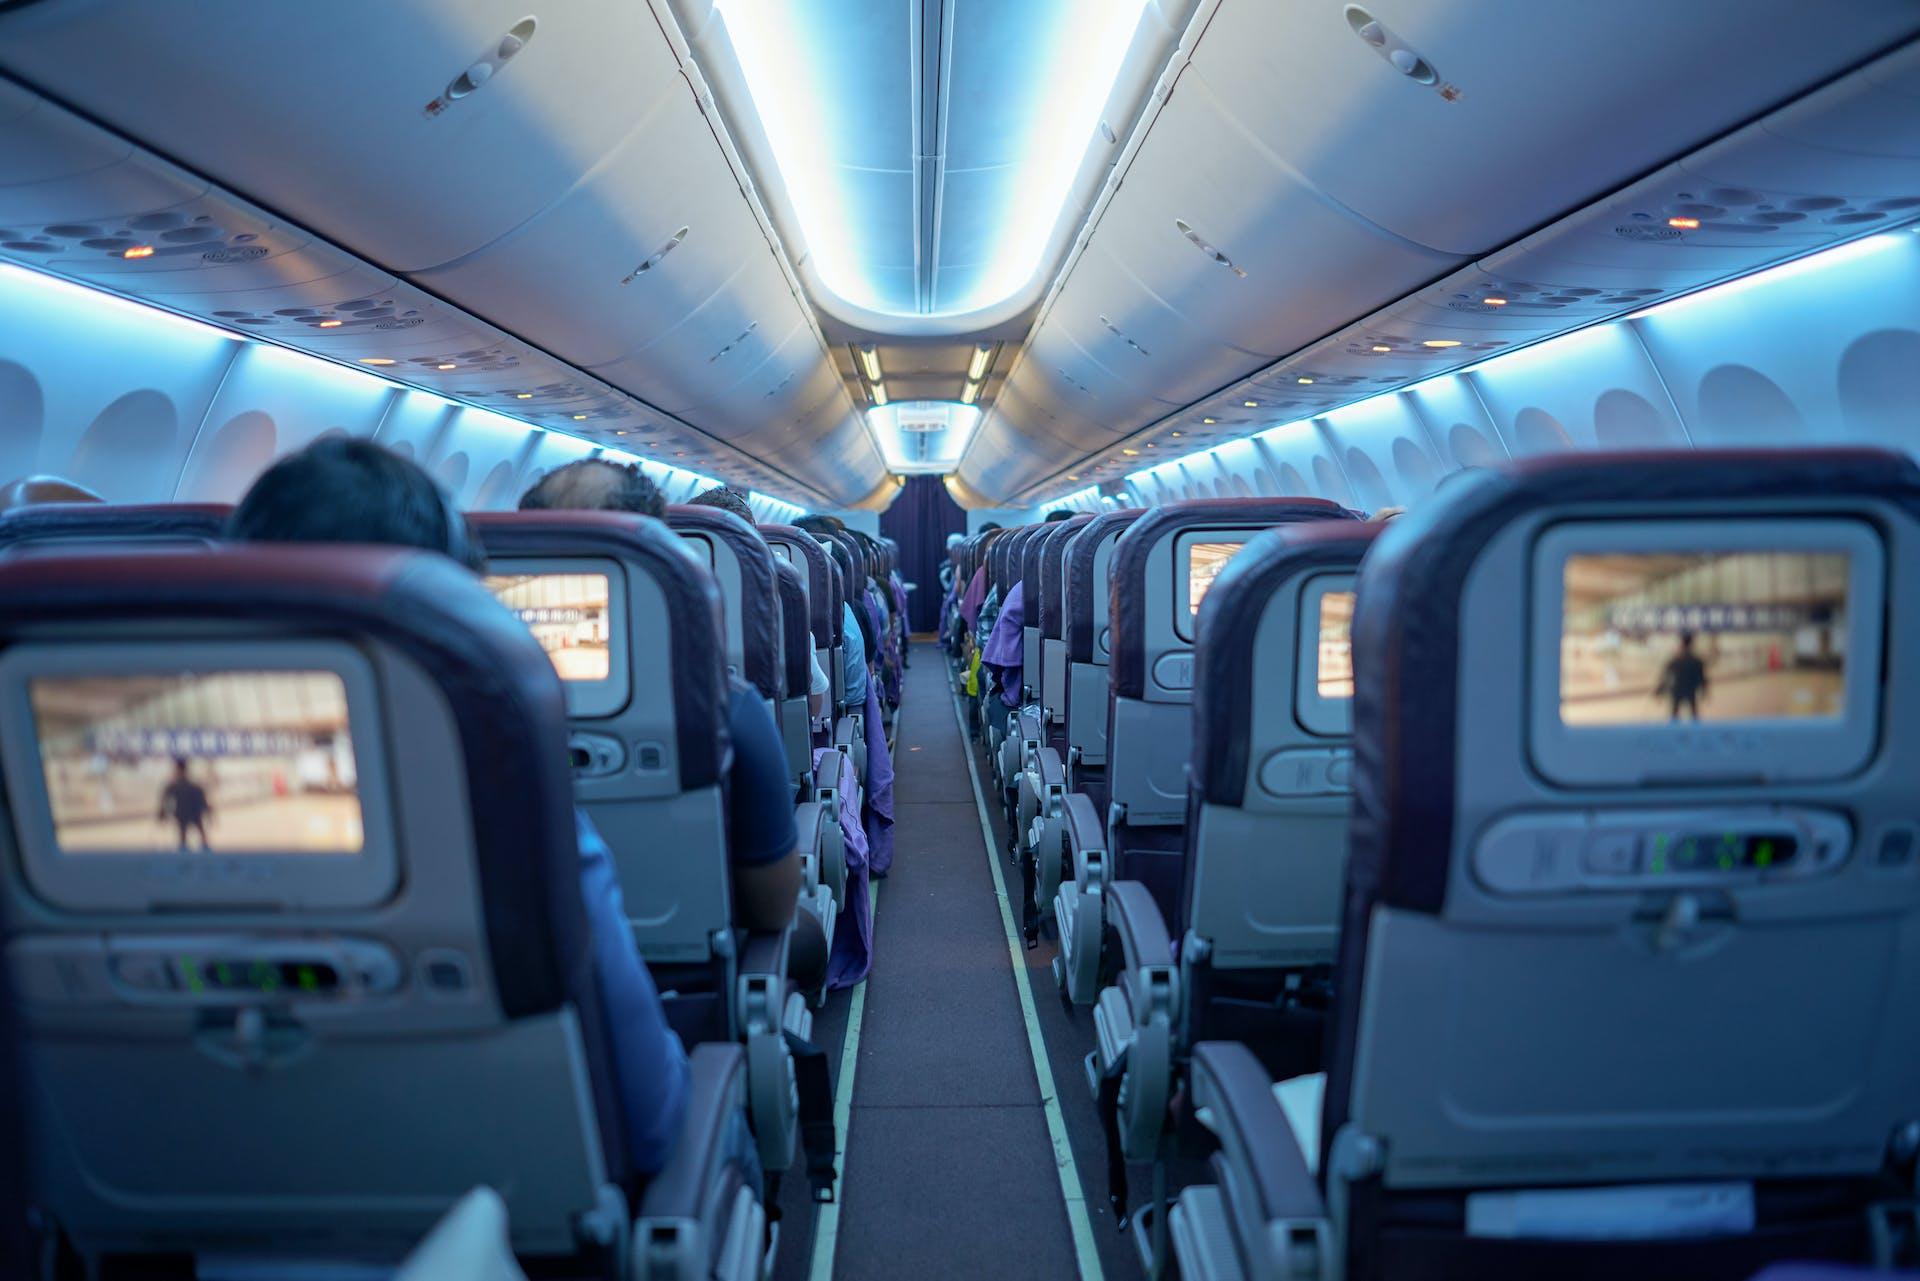 Chartered aircraft offer endless branding opportunities for sponsors.